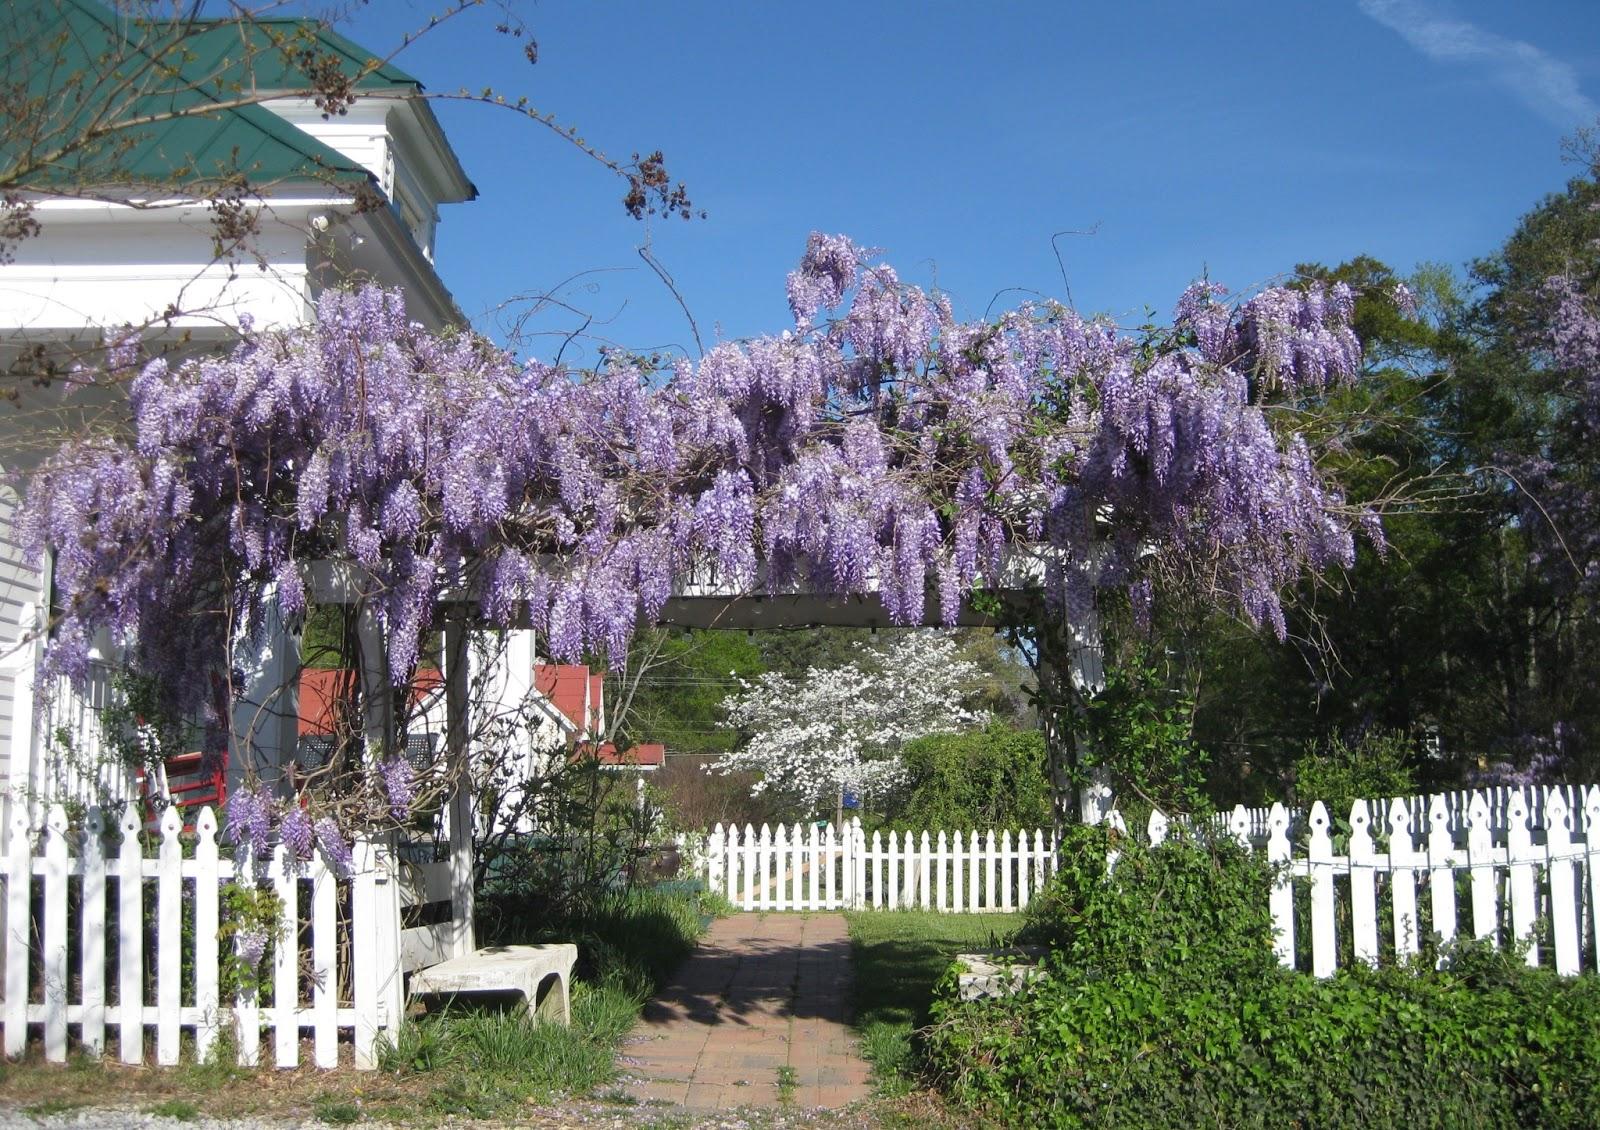 Garden Walk Buffalo Through The Garden Gates 6: Good Things Happened: Wisteria, Music On The Main Street